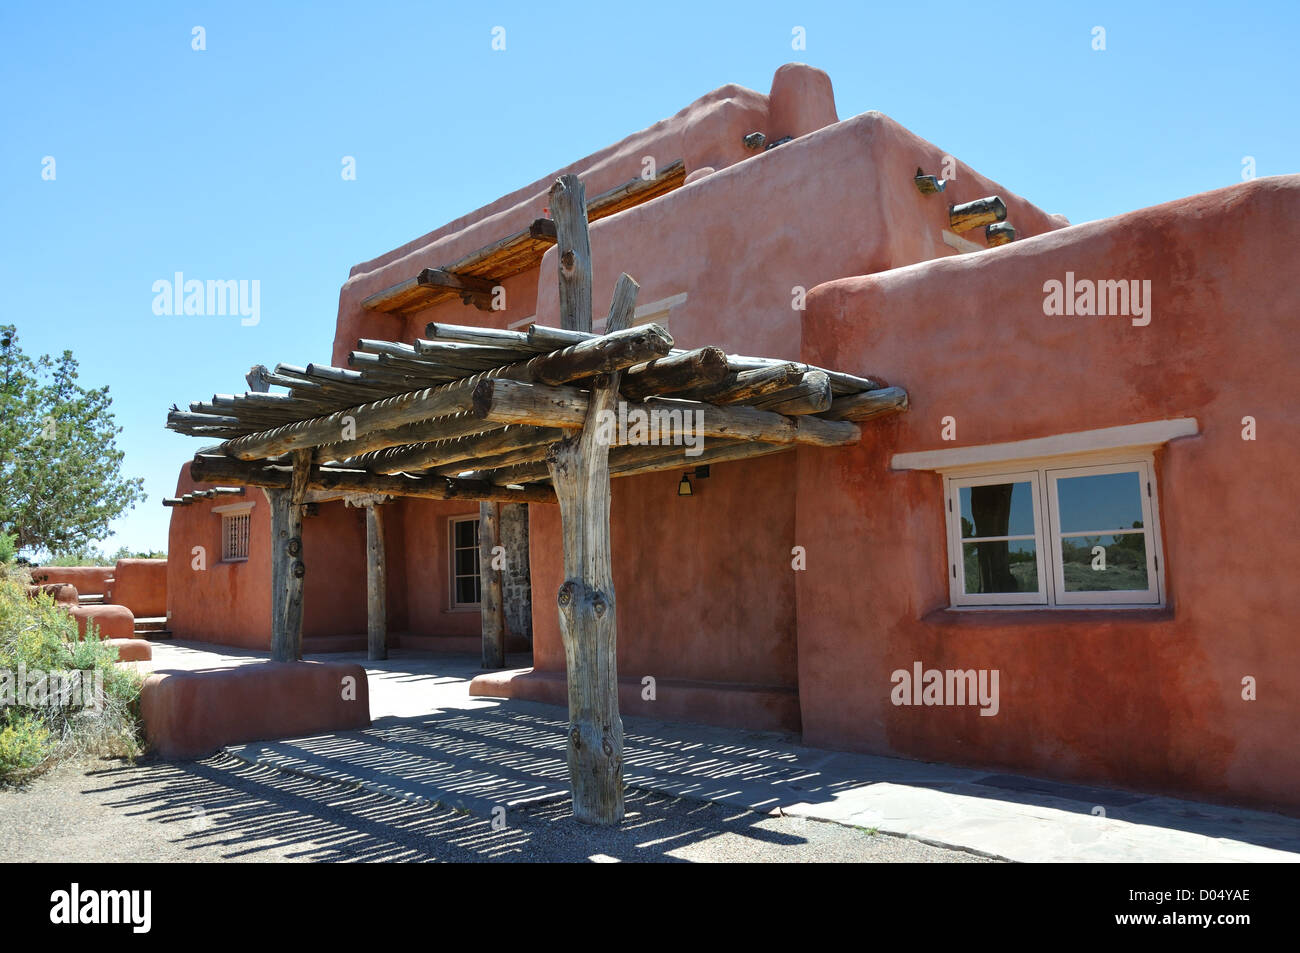 Adobe Style House Arizona Usa Stock Photo 51740374 Alamy